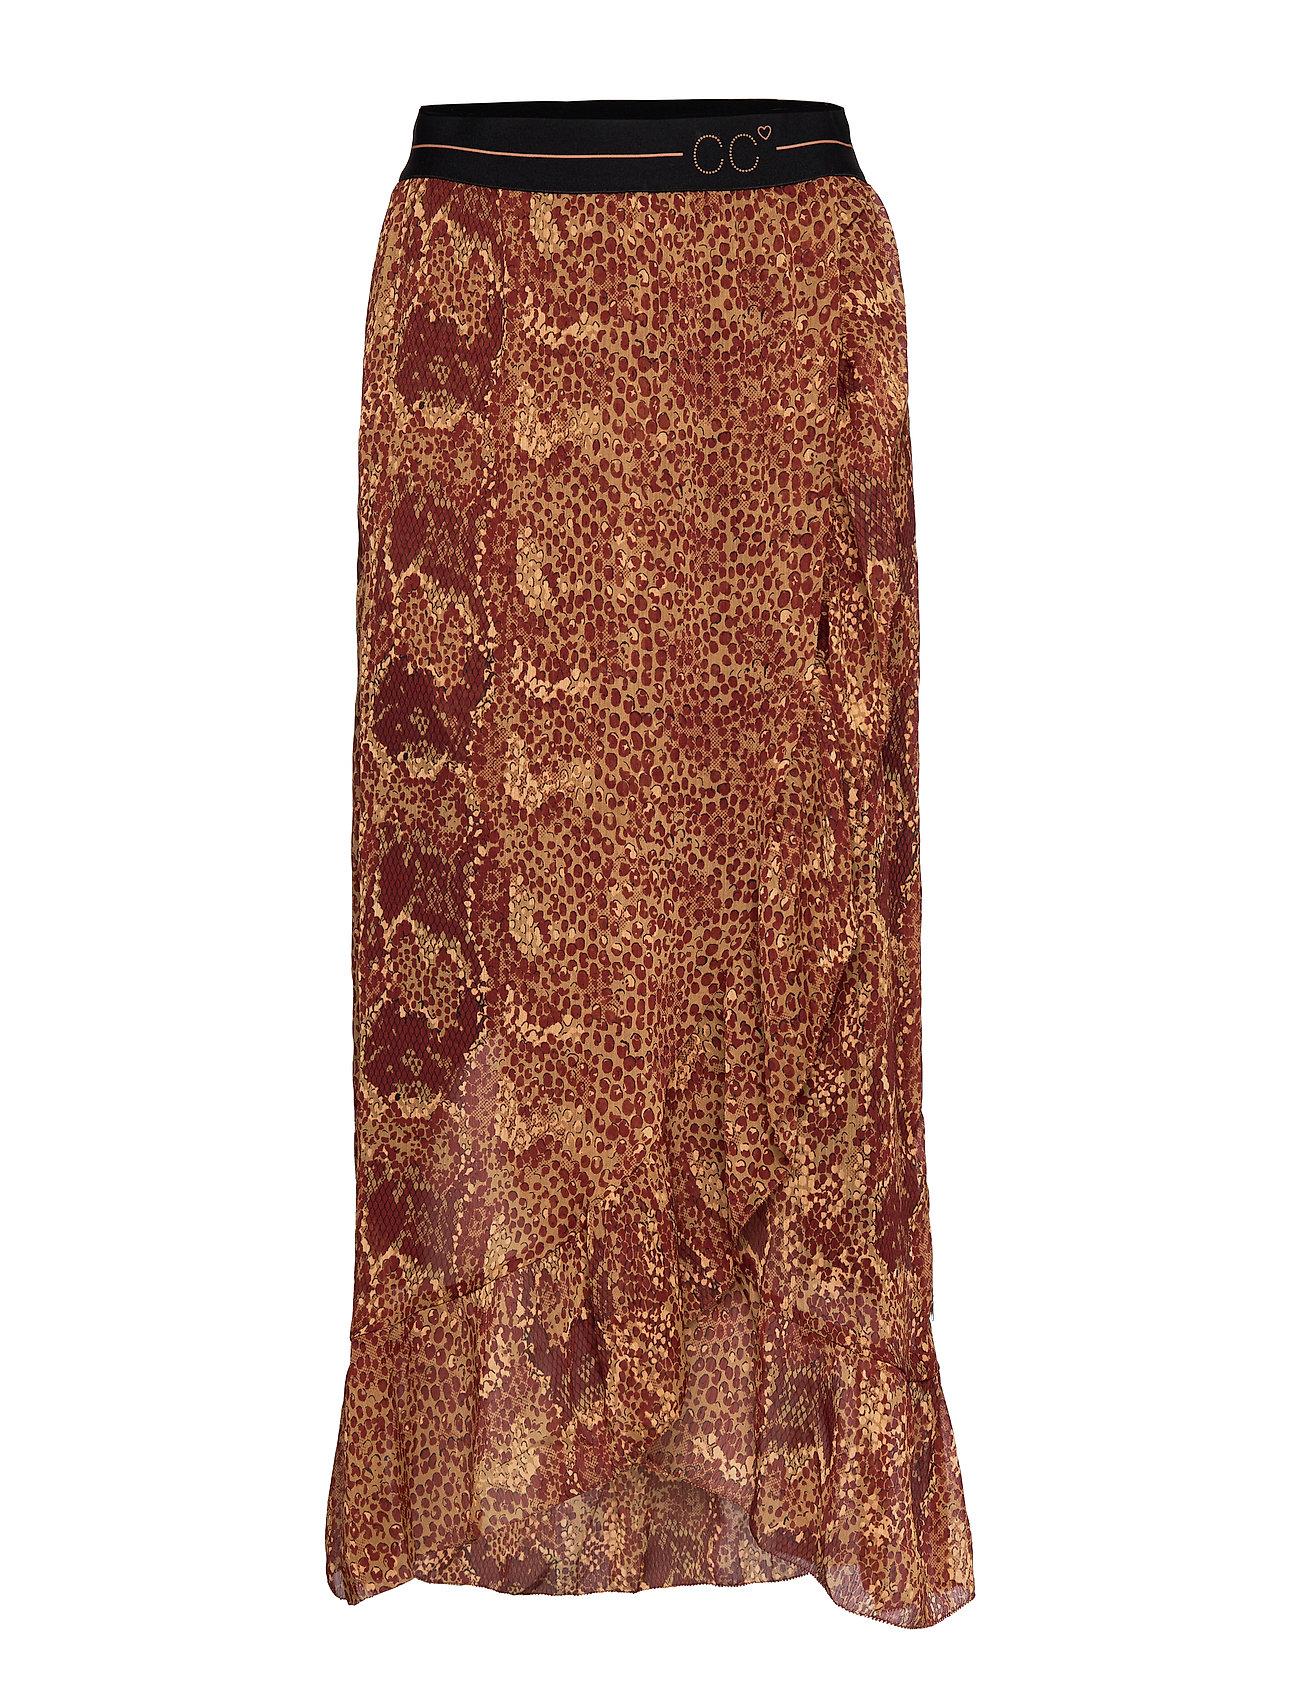 Coster Copenhagen Skirt w. pyton print and frill - NOMADE PYTON